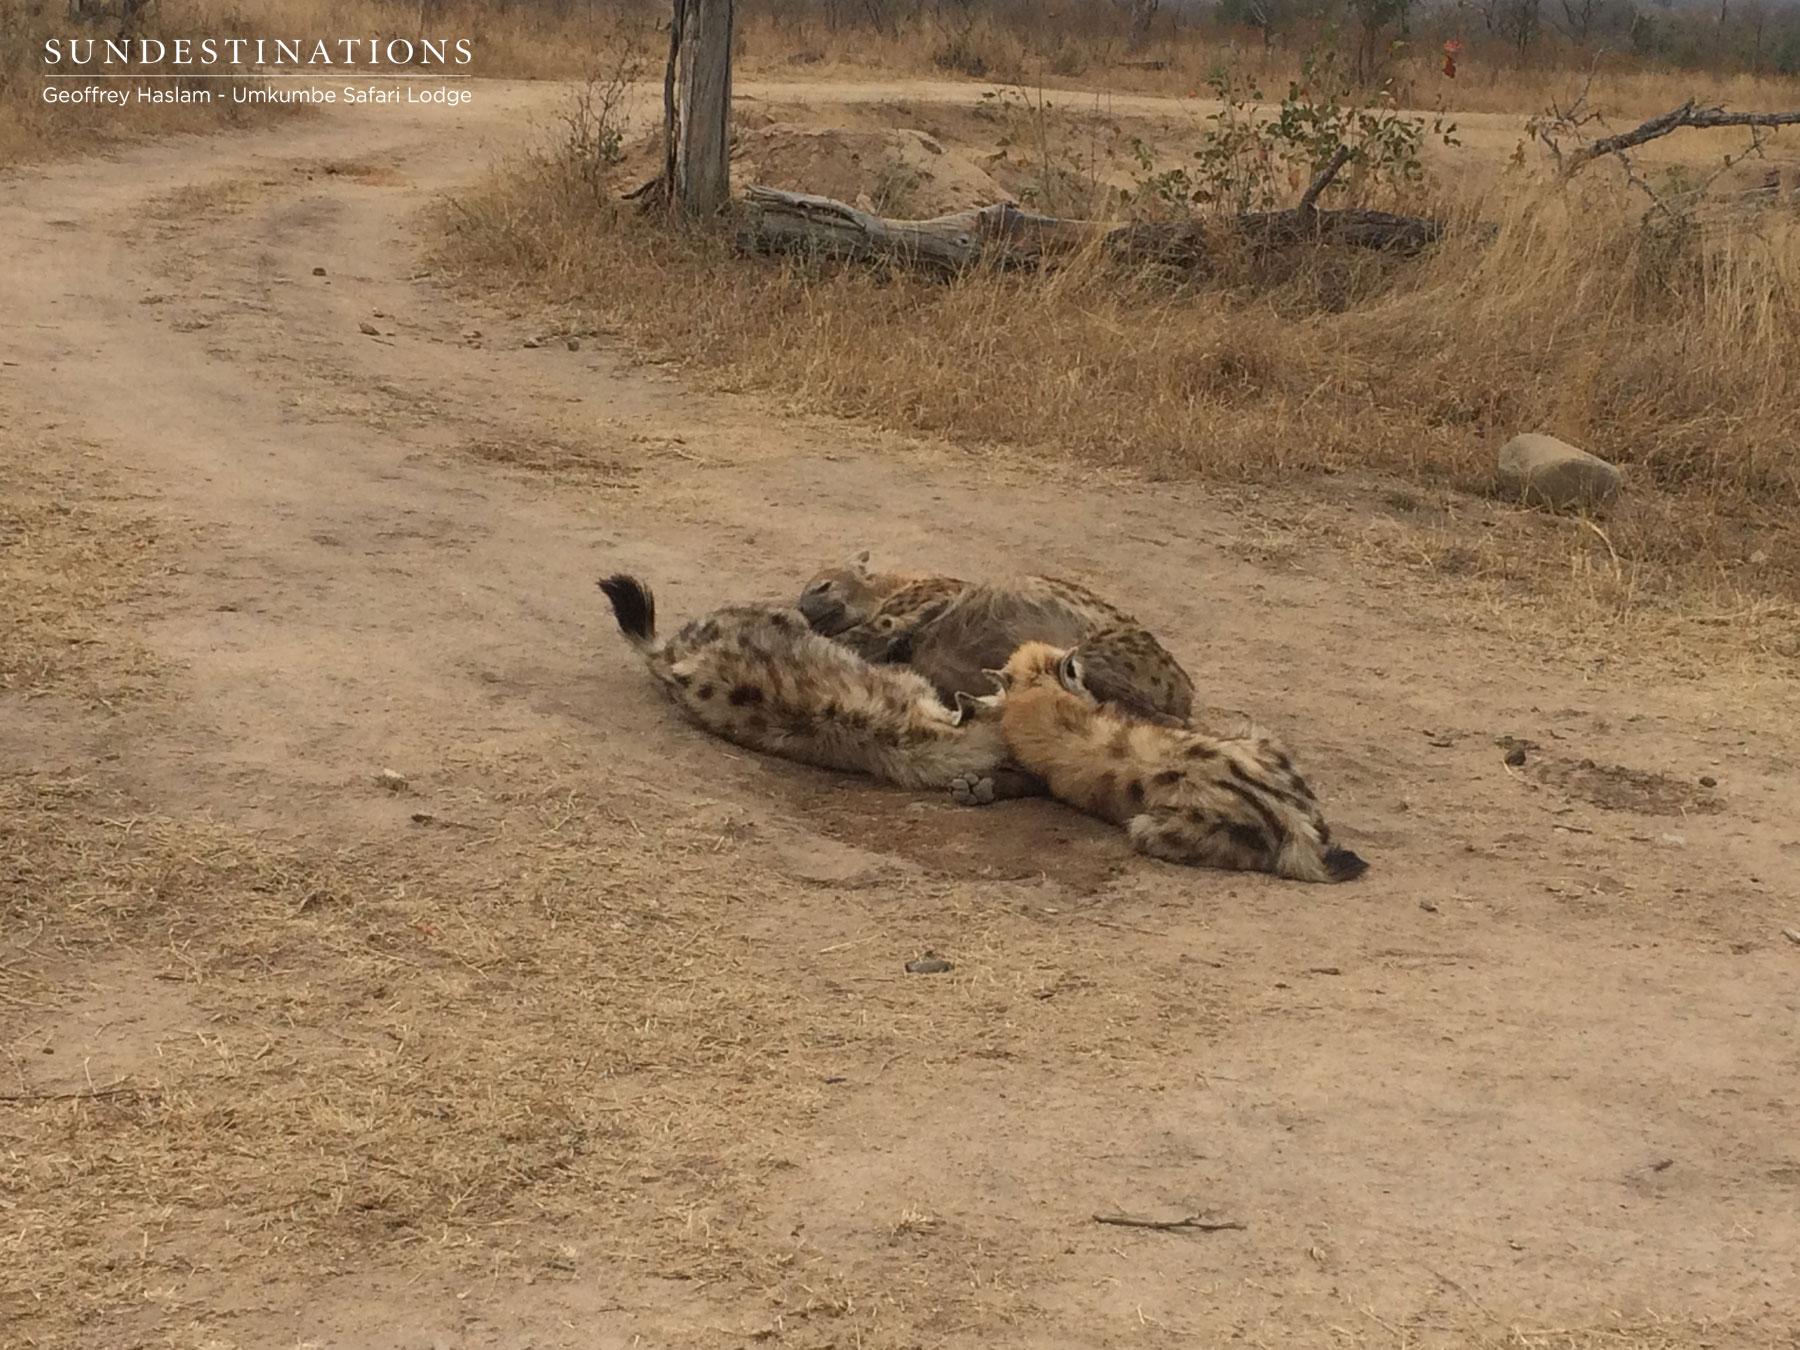 Hyena at Umkumbe